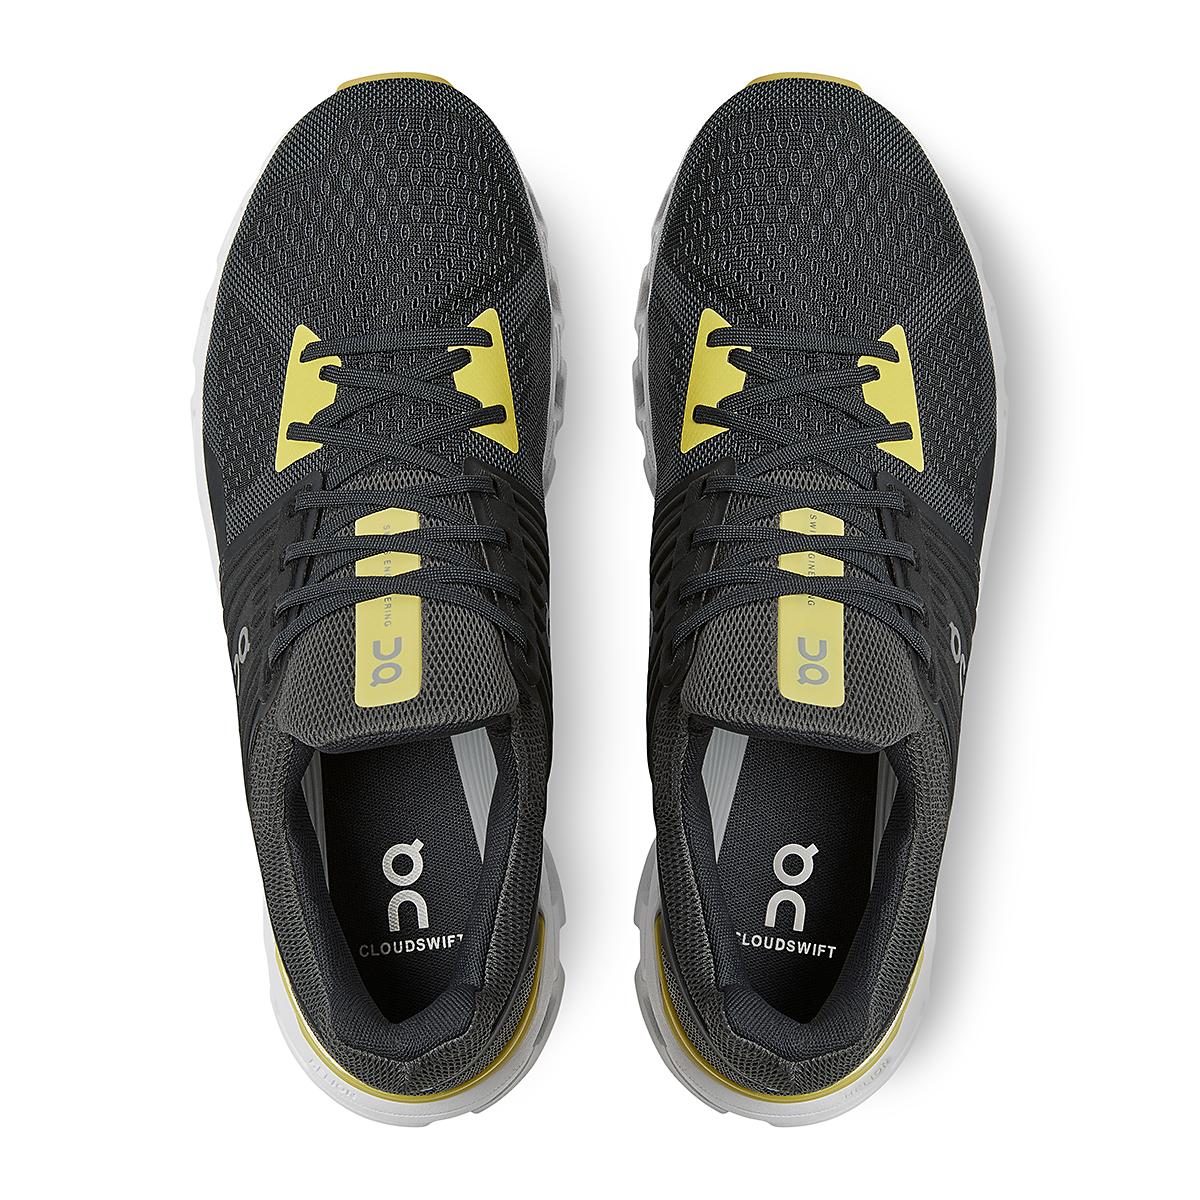 Men's On Cloudswift 2.0 Running Shoe - Color: Magnet/Citron - Size: 7 - Width: Regular, Magnet/Citron, large, image 4